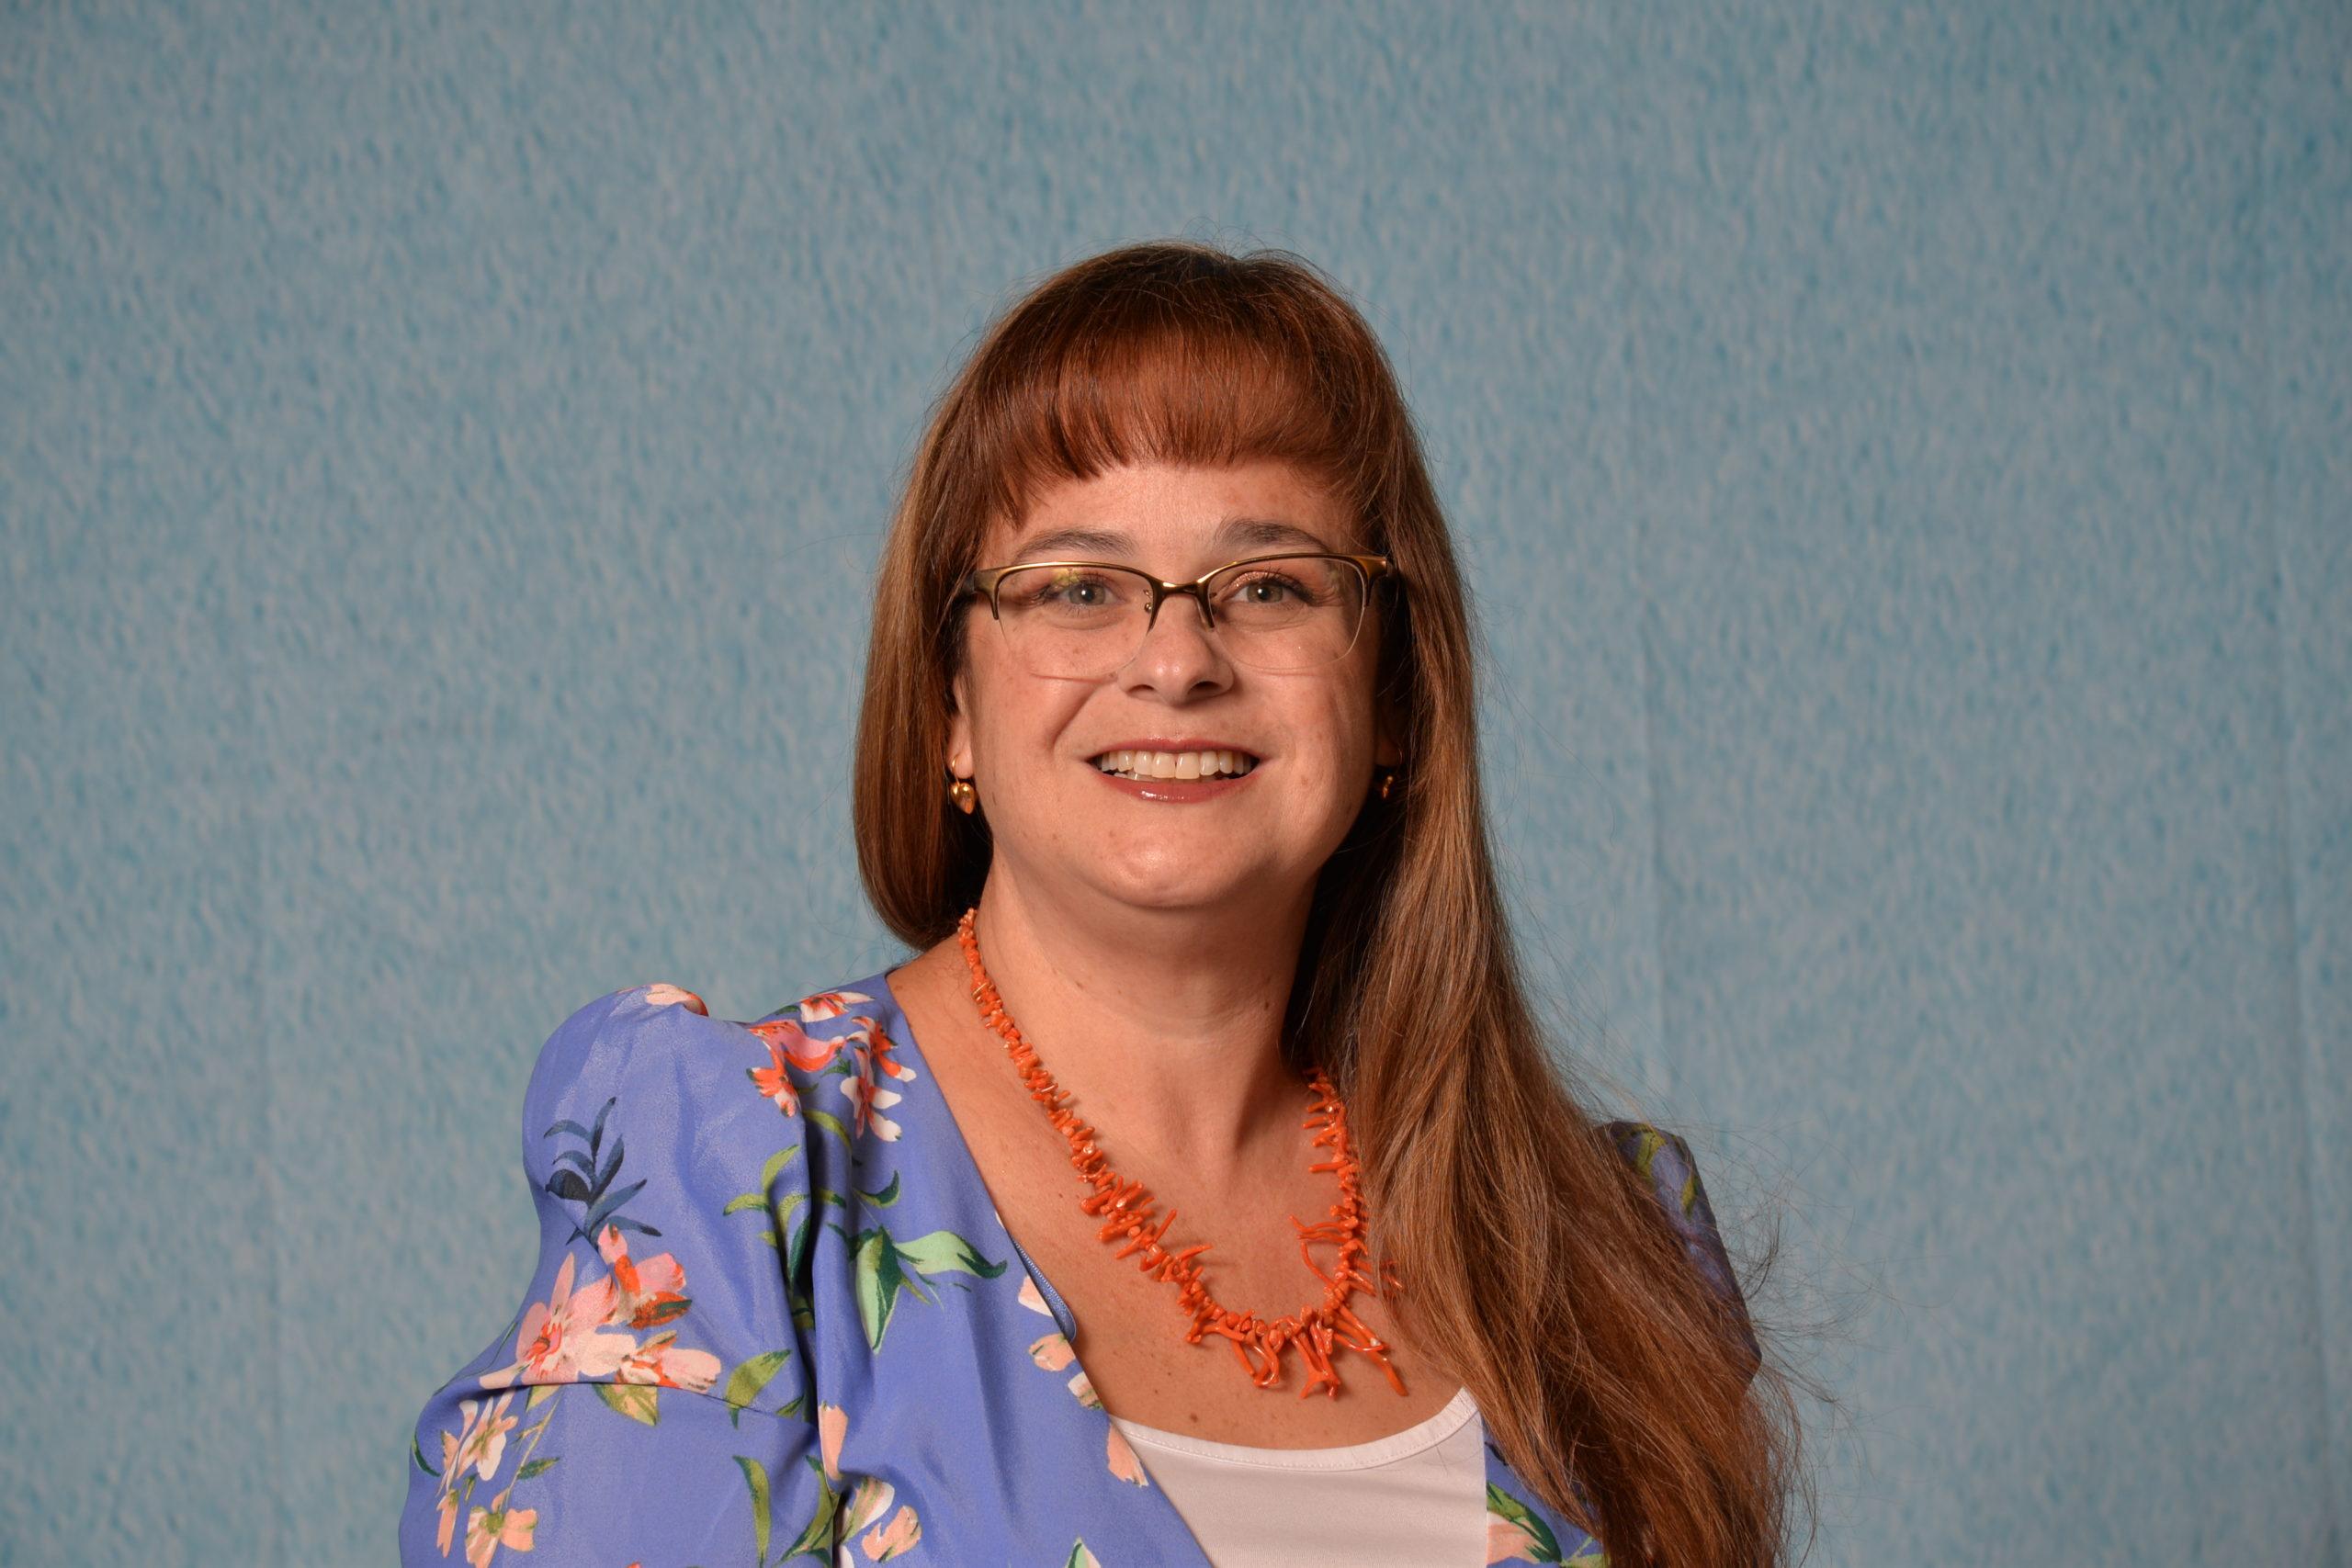 Jessica Lovasz - Leader